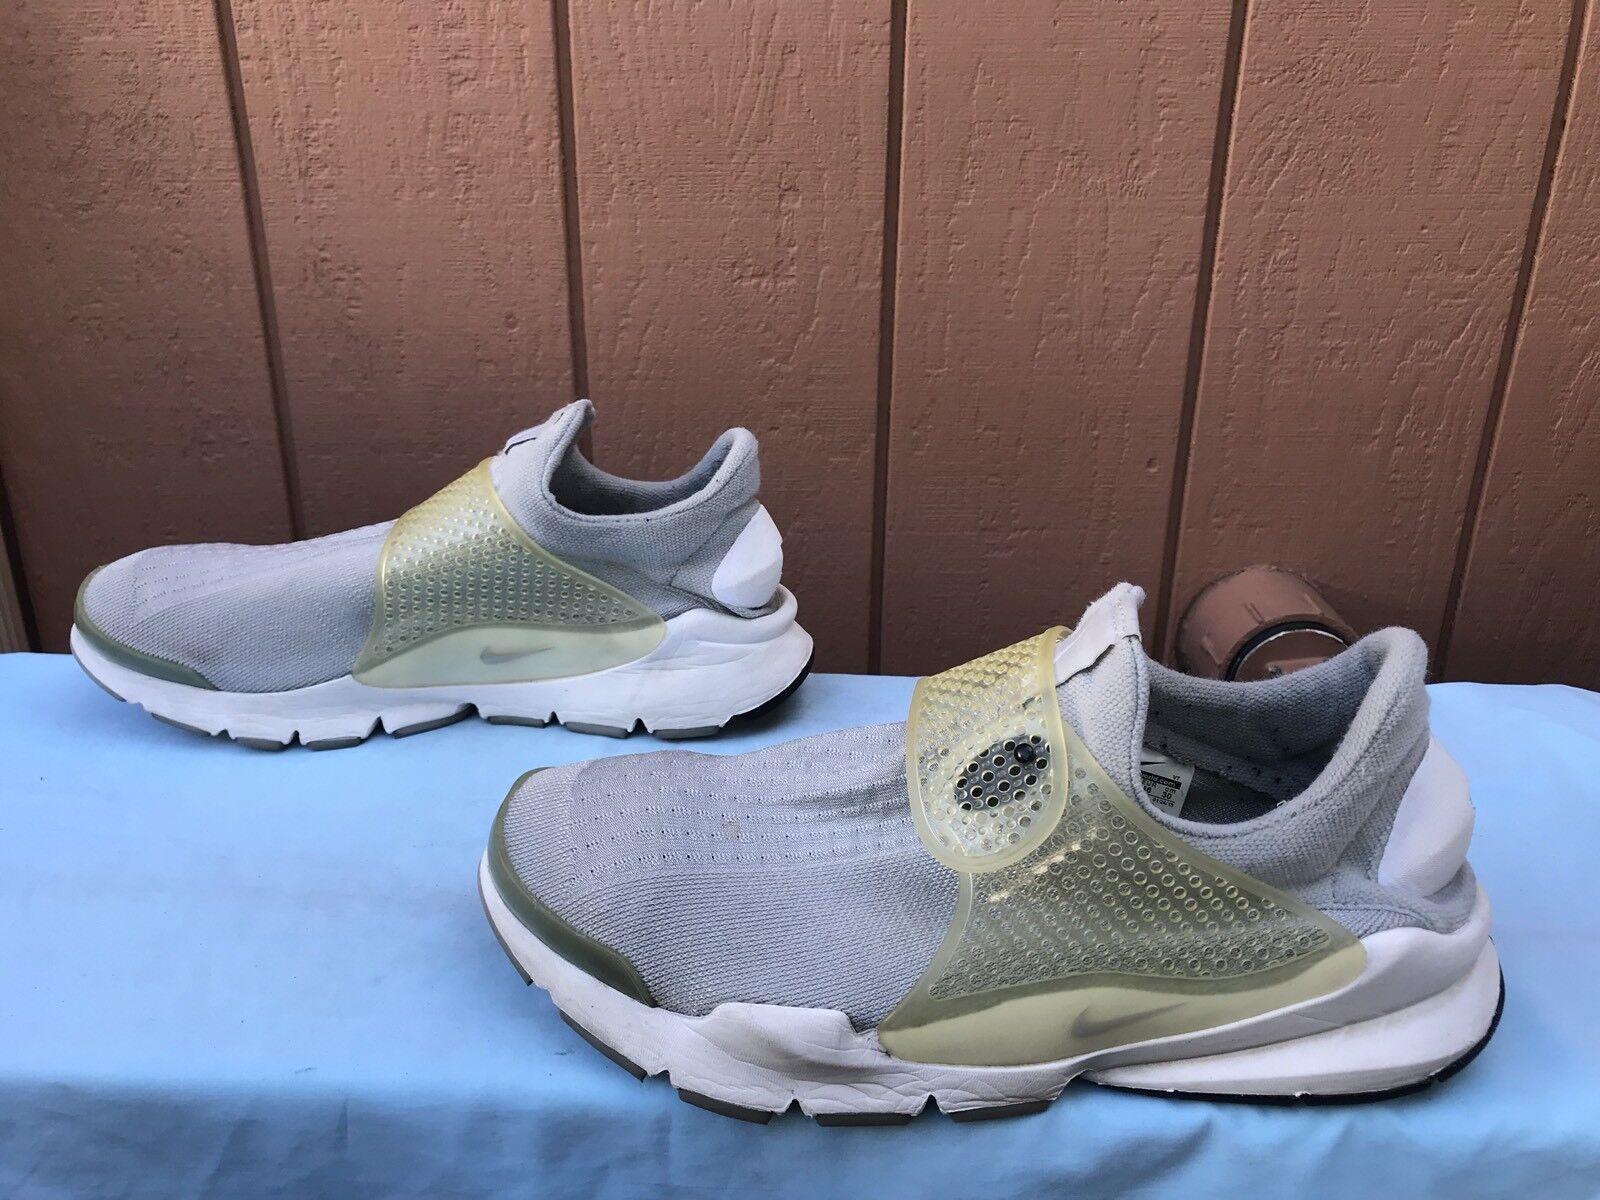 RARE! EUC Nike Sock Dart SP 686058 011 Men's Size US 12 Gray Running Shoes A6